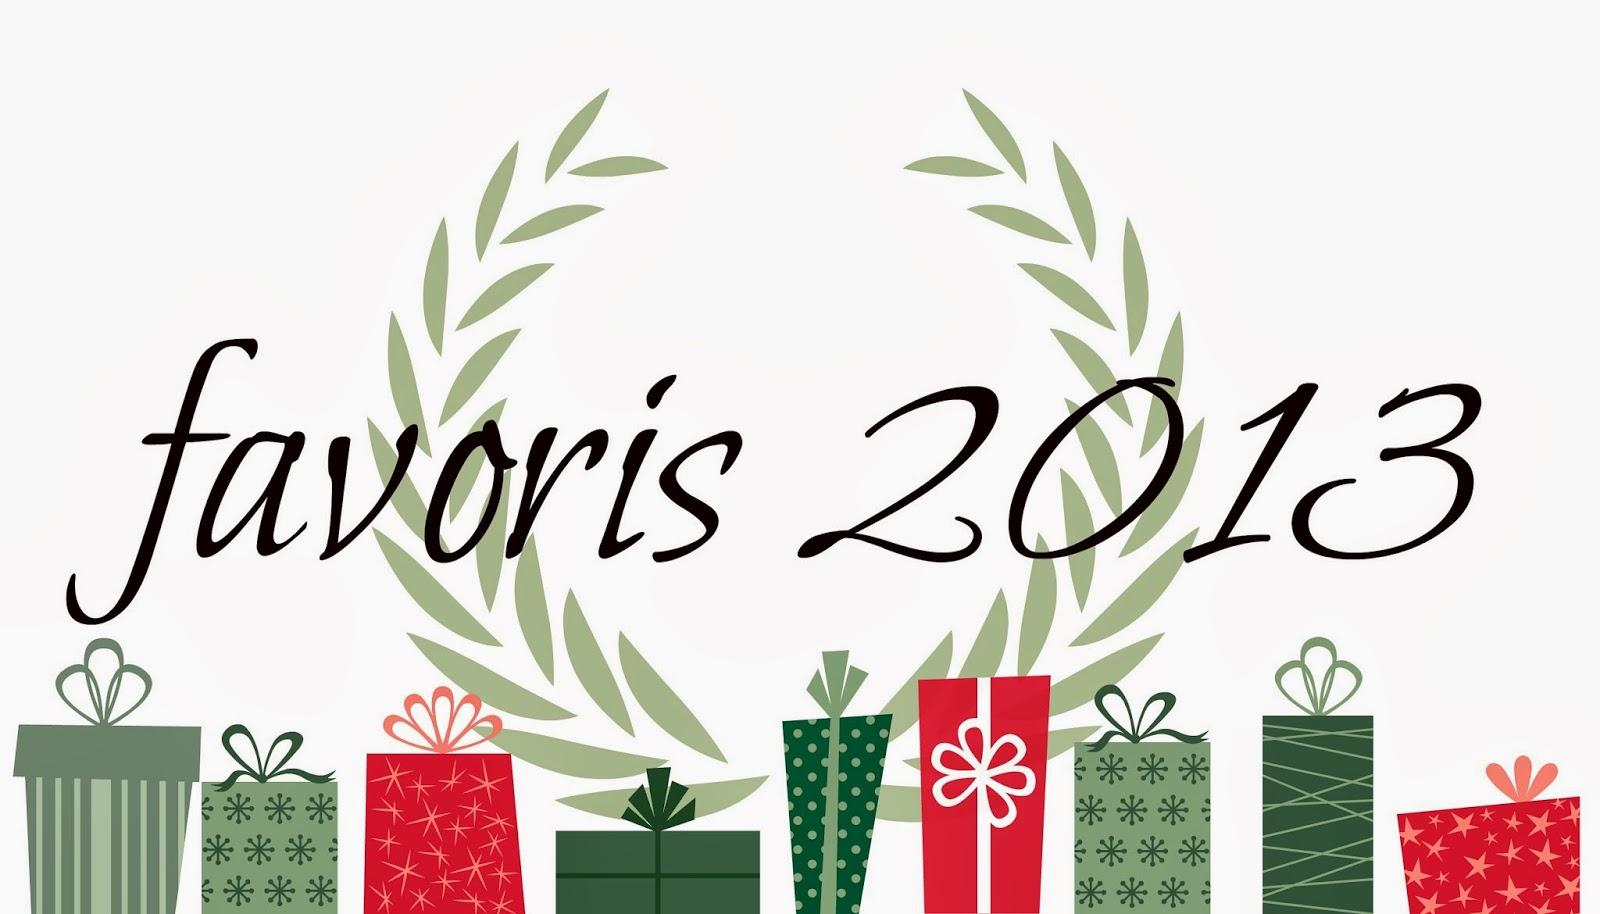 ♥♥ Favoris 2013 ♥♥